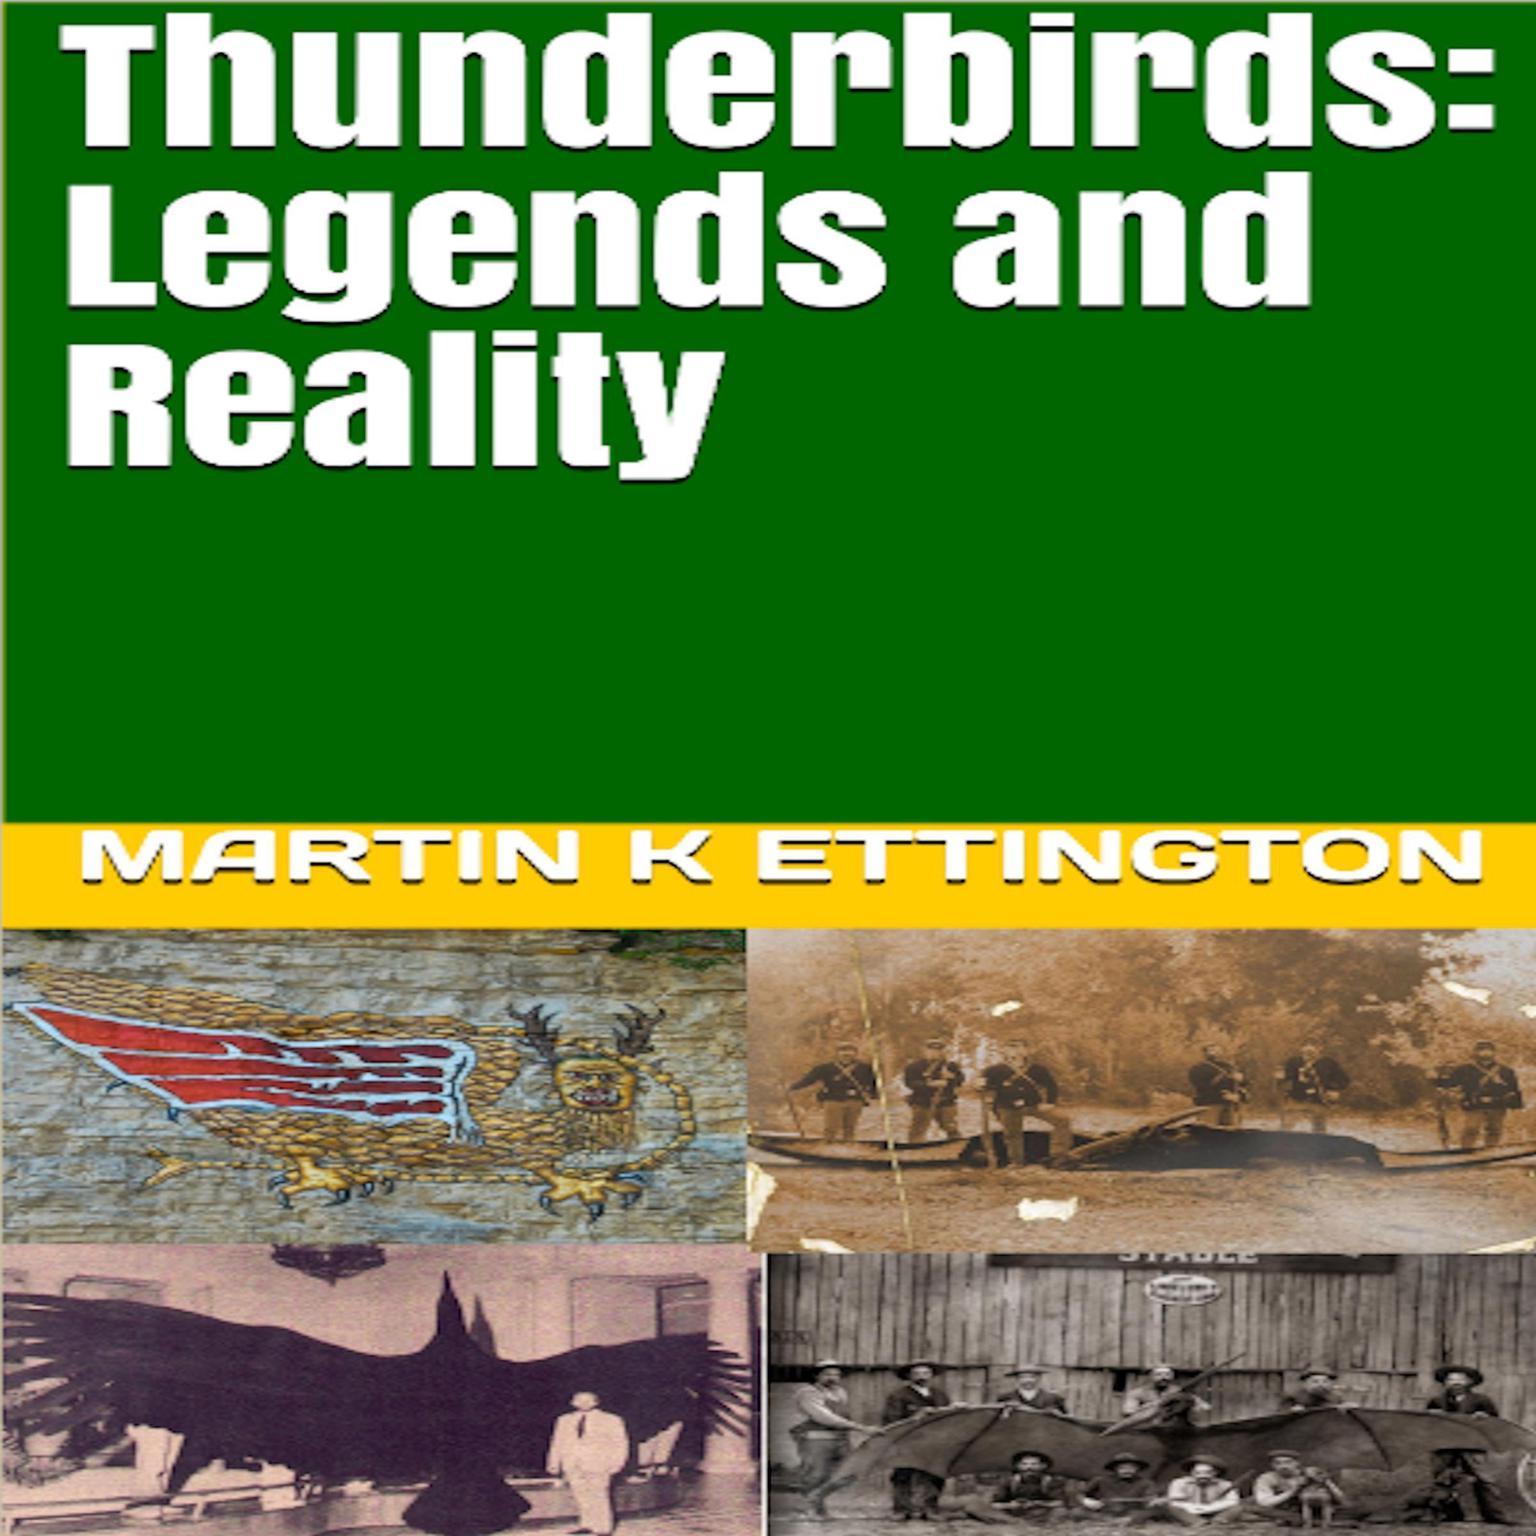 Thunderbirds: Legends and Reality Audiobook, by Martin K. Ettington